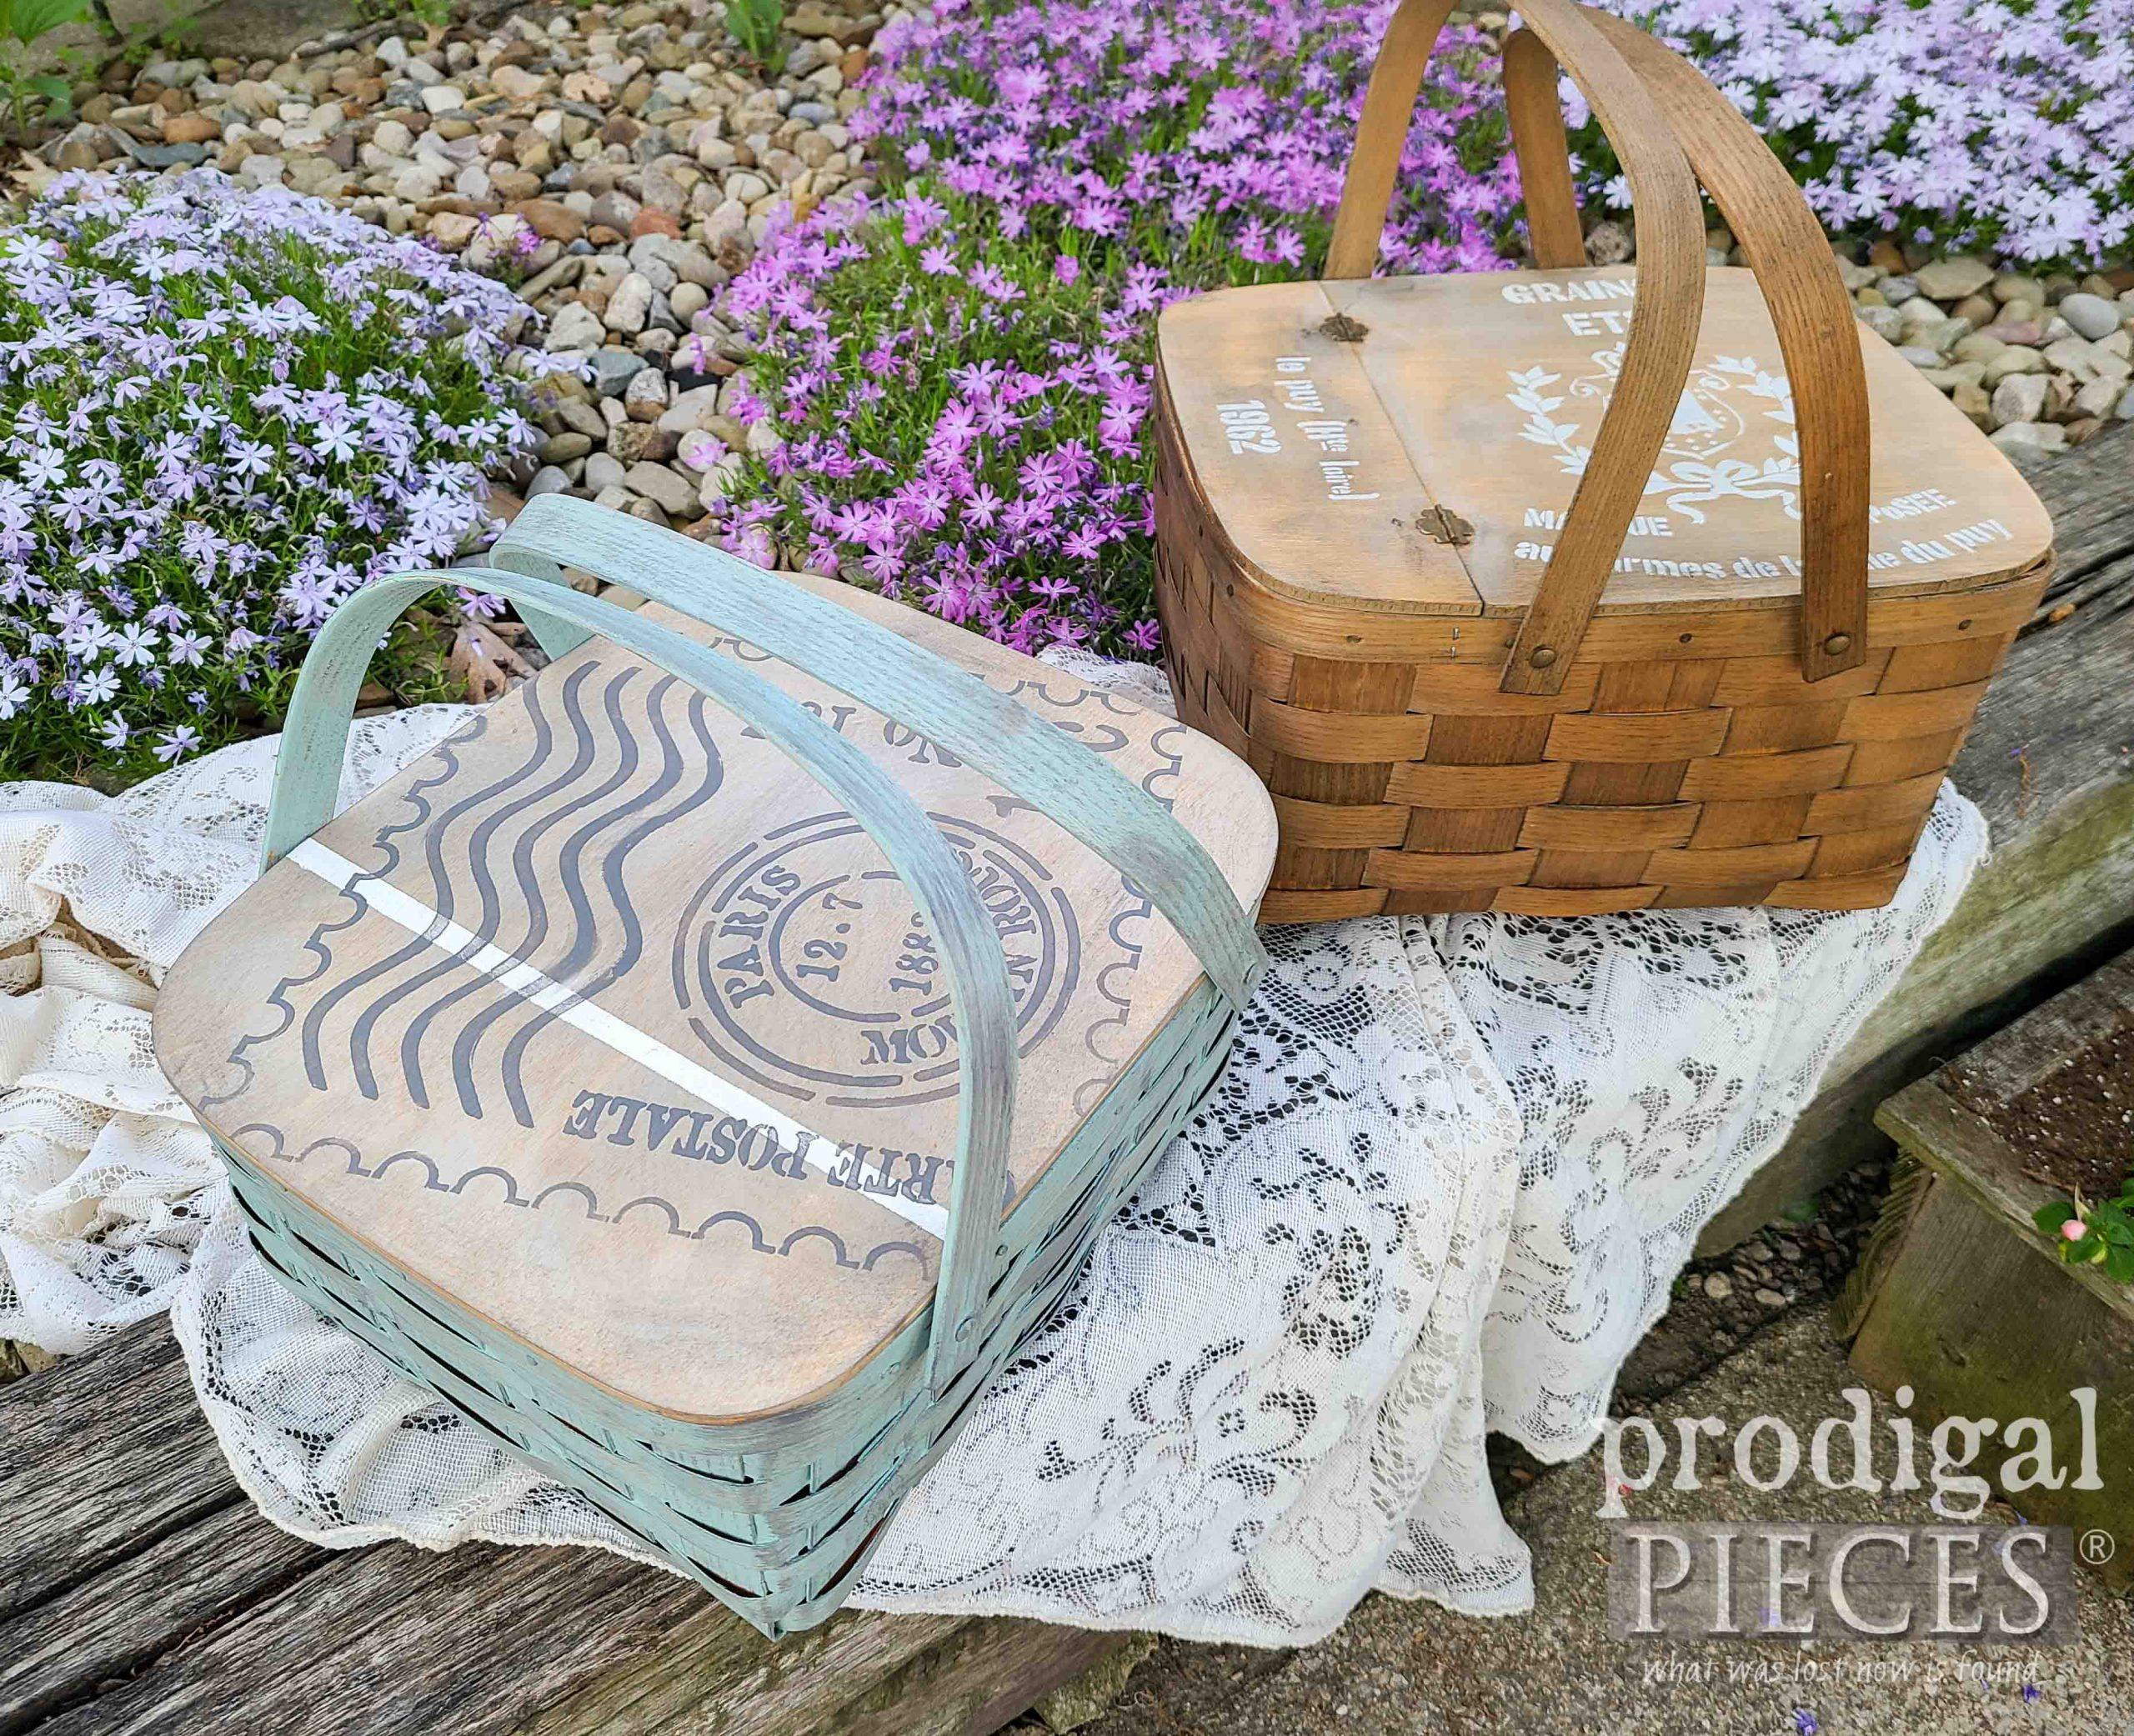 DIY Repurposed Vintage Picnic Baskets by Larissa of Prodigal Pieces | prodigalpieces.com #prodigalpieces #farmhouse #vintage #home #summer